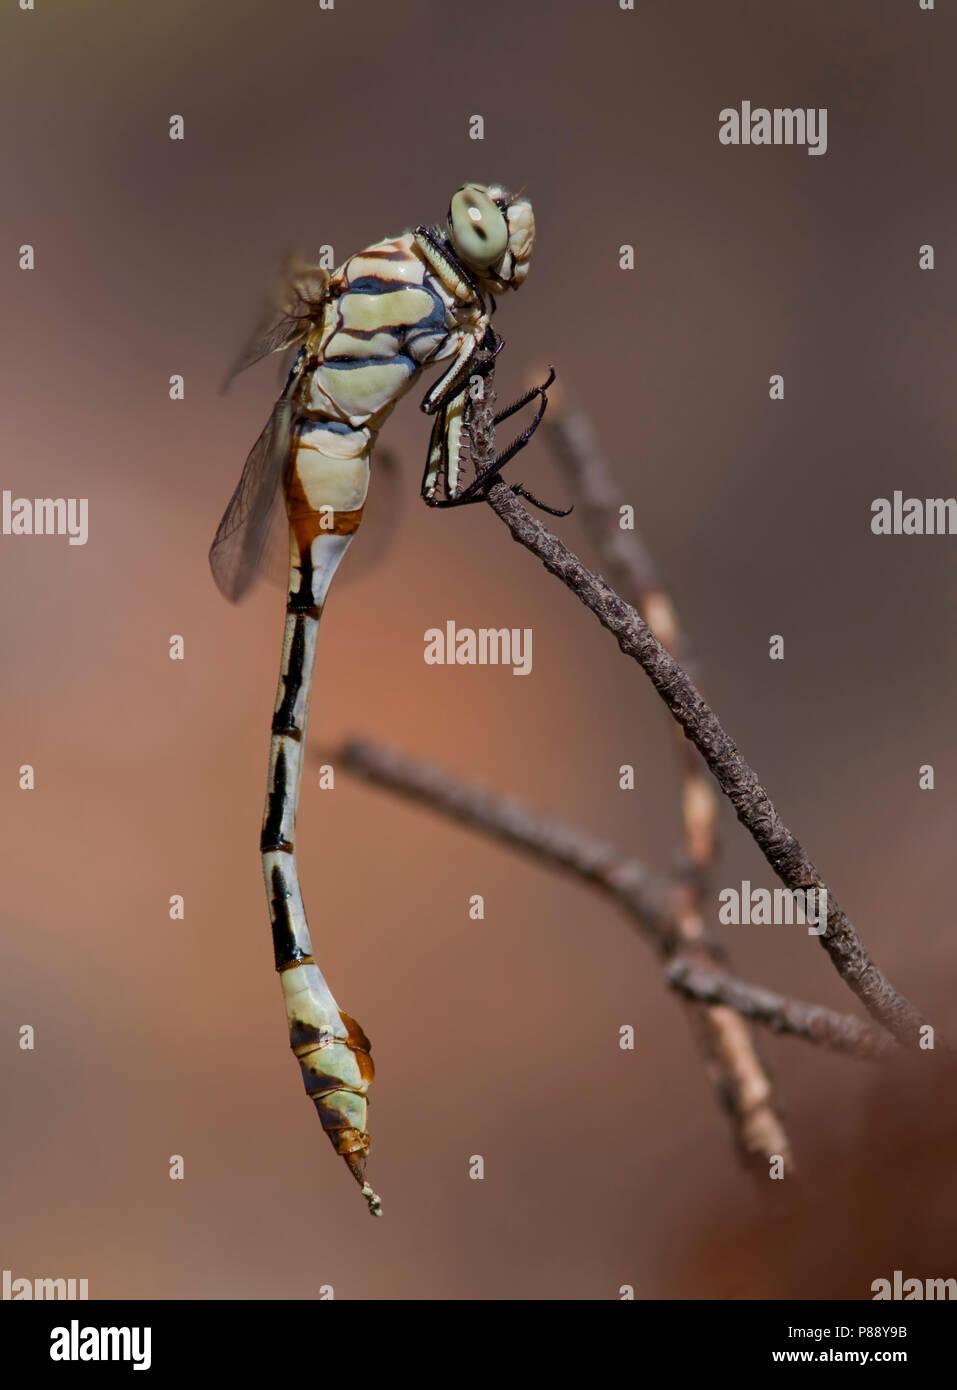 Imago Vaandeldrager; Bladetail adulti Immagini Stock